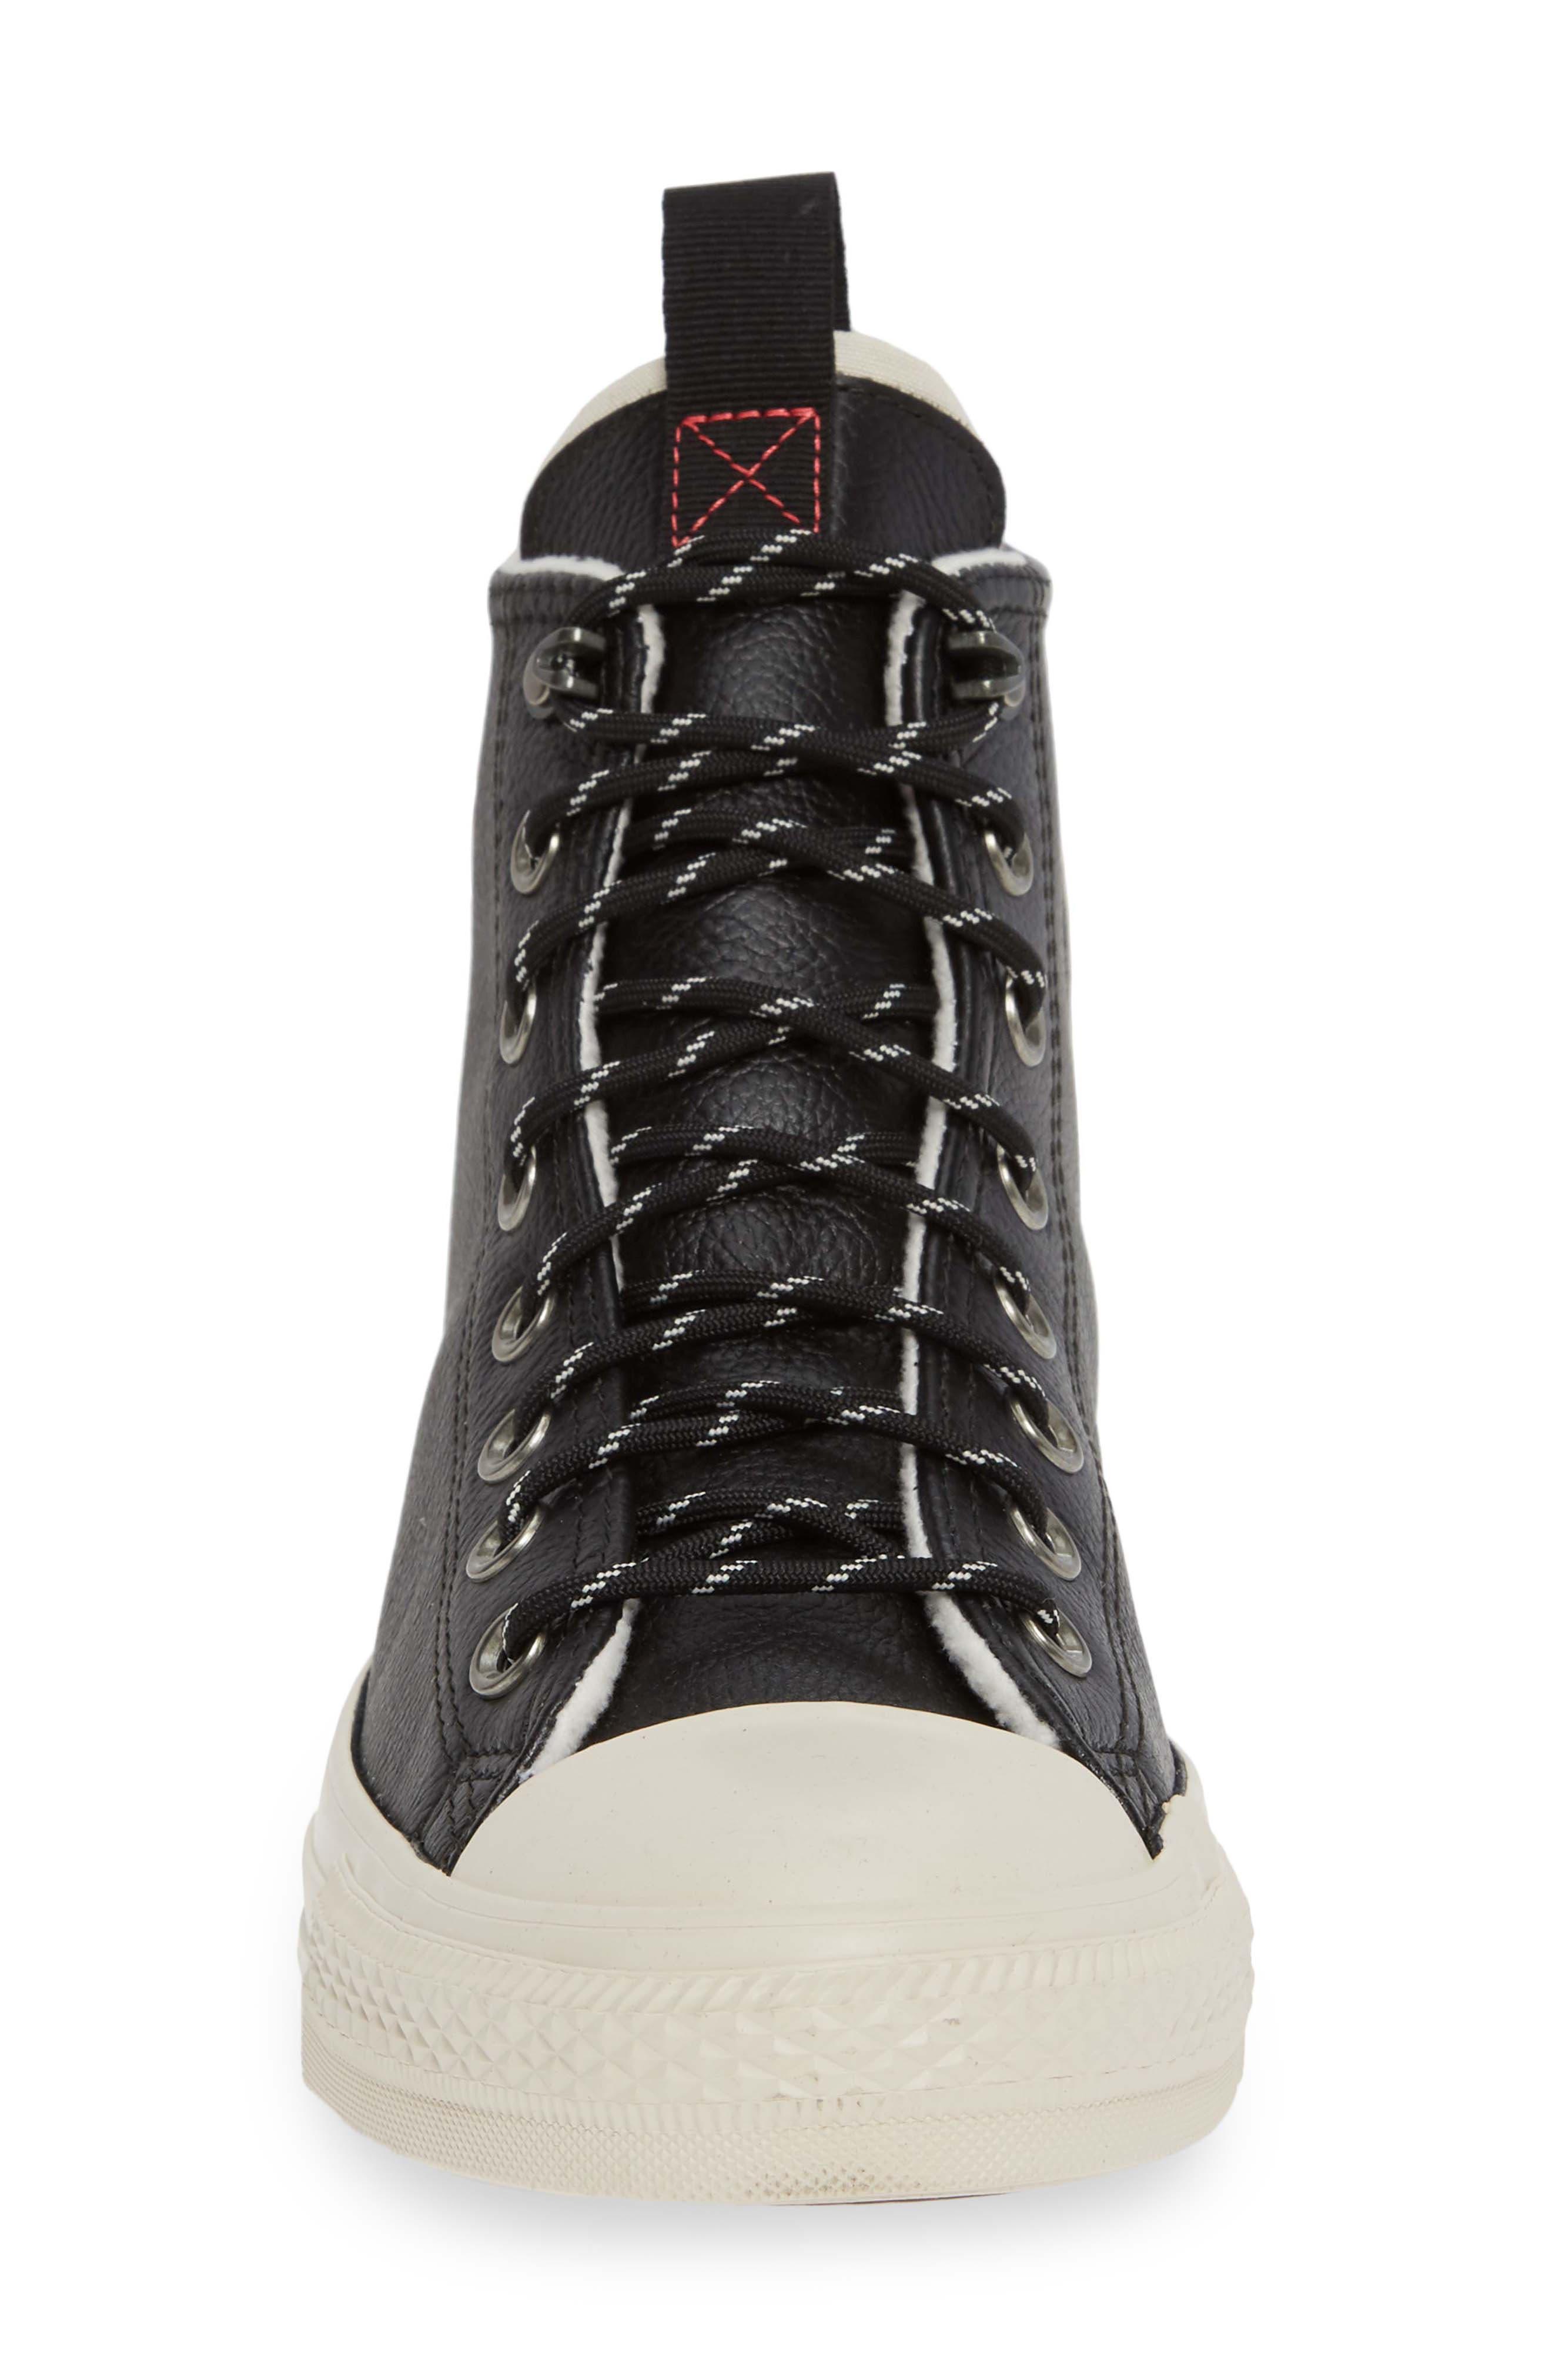 Chuck Taylor<sup>®</sup> All Star<sup>®</sup> Desert Storm Hi Sneaker,                             Alternate thumbnail 4, color,                             MASON/ BLACK/ DRIFTWOOD